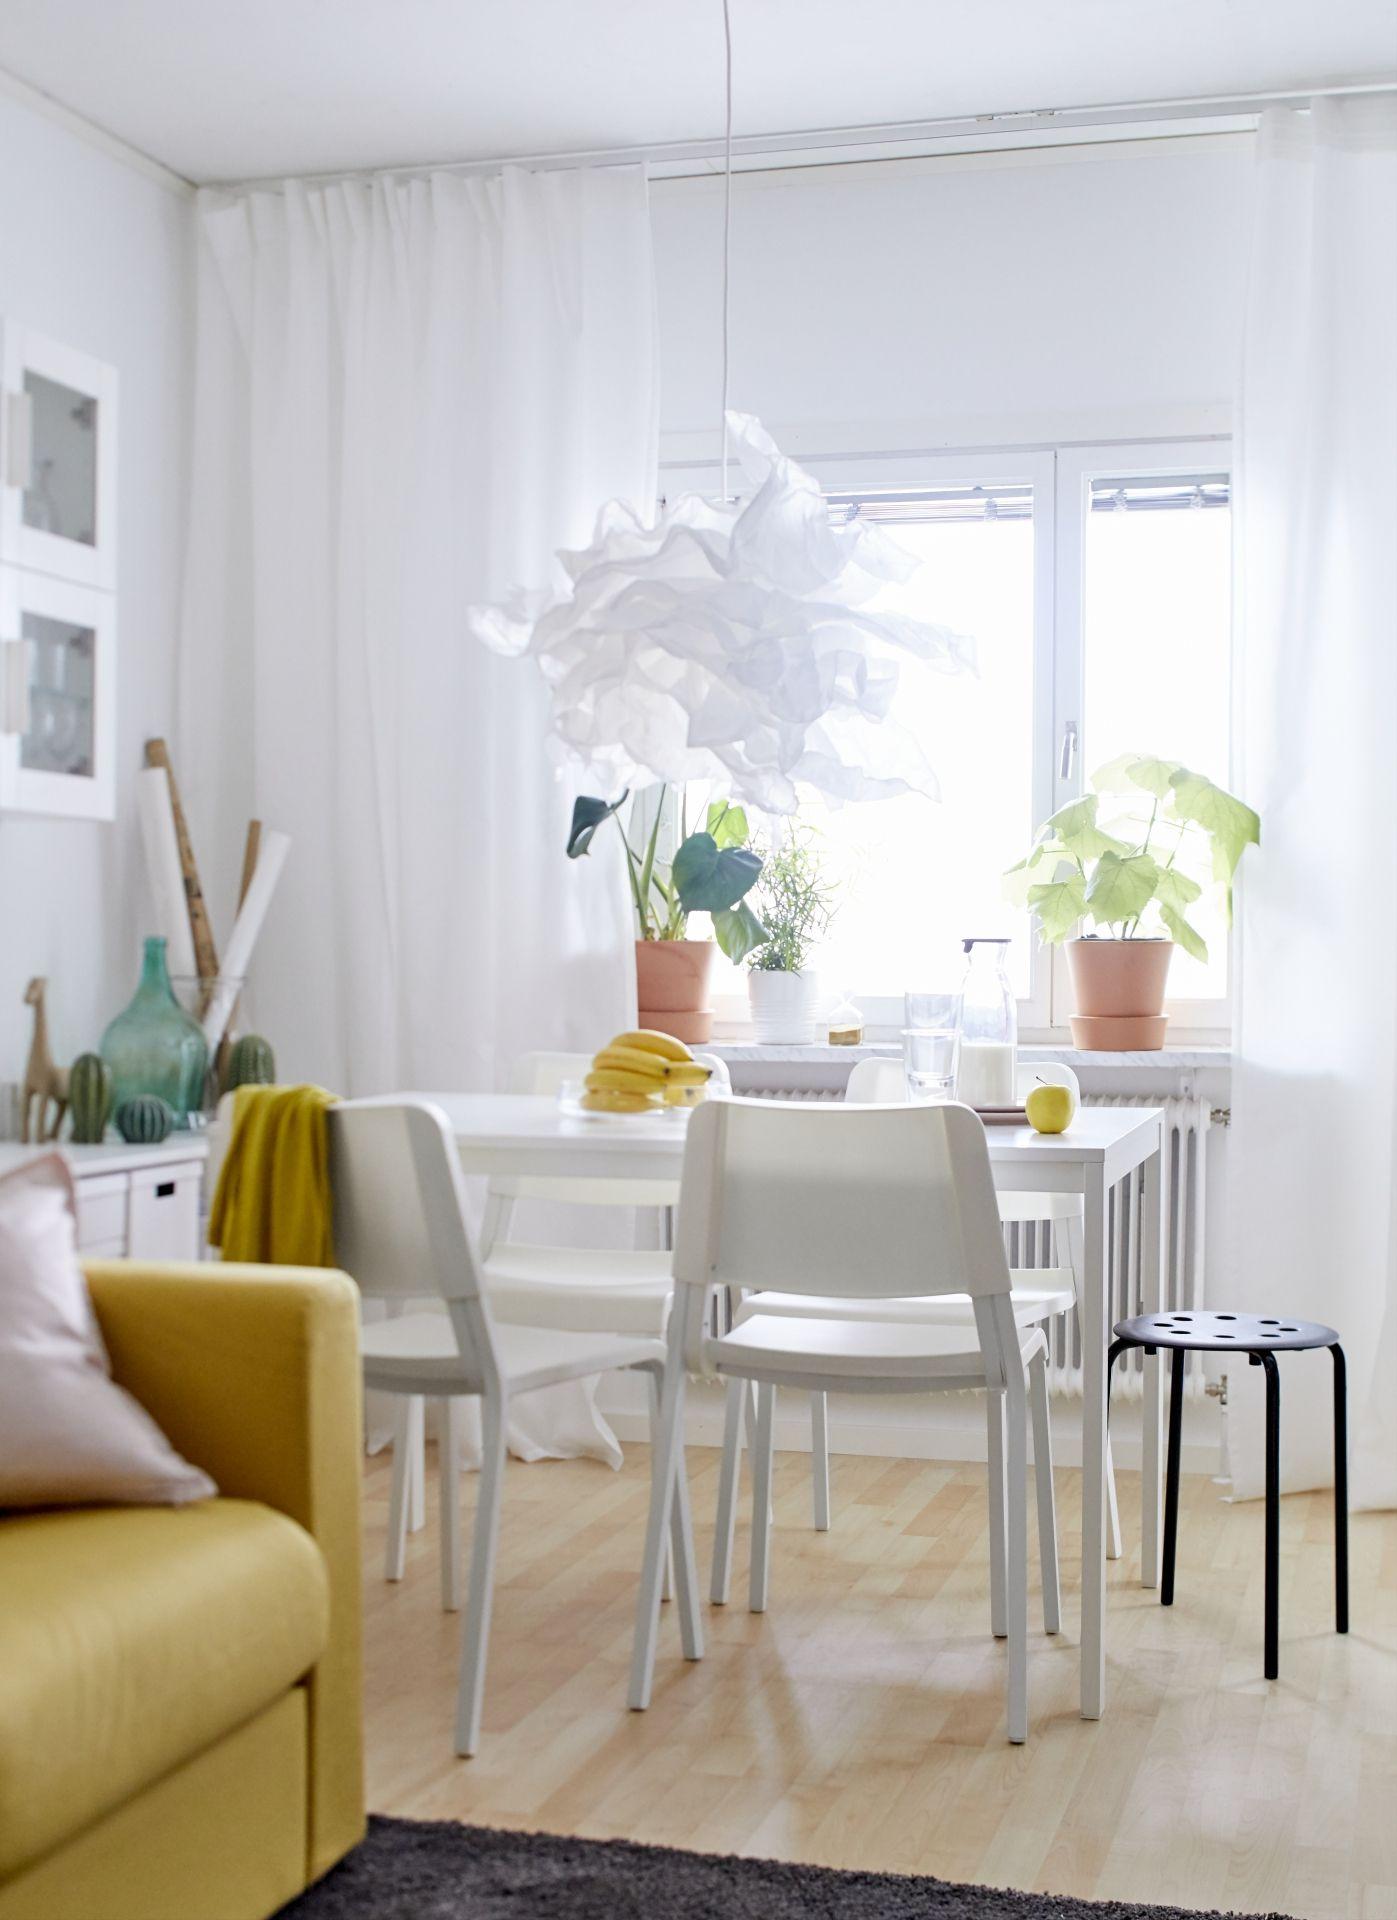 Ikea Salon Tafel Wit.Teodores Eetkamerstoel Wit In 2019 Table Ikea Living